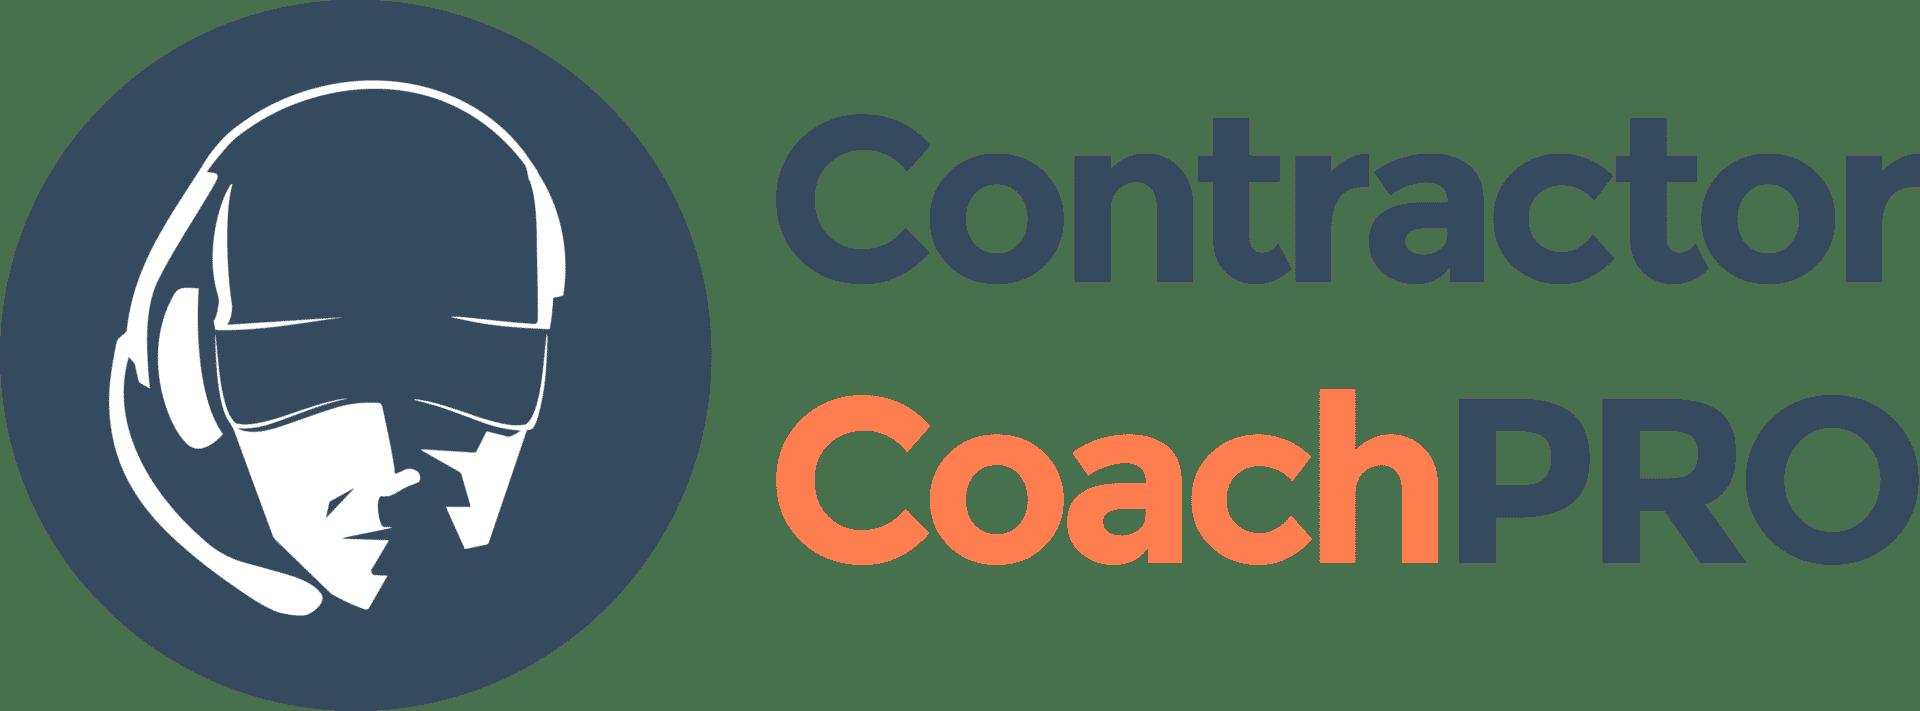 Contractor Coach Pro